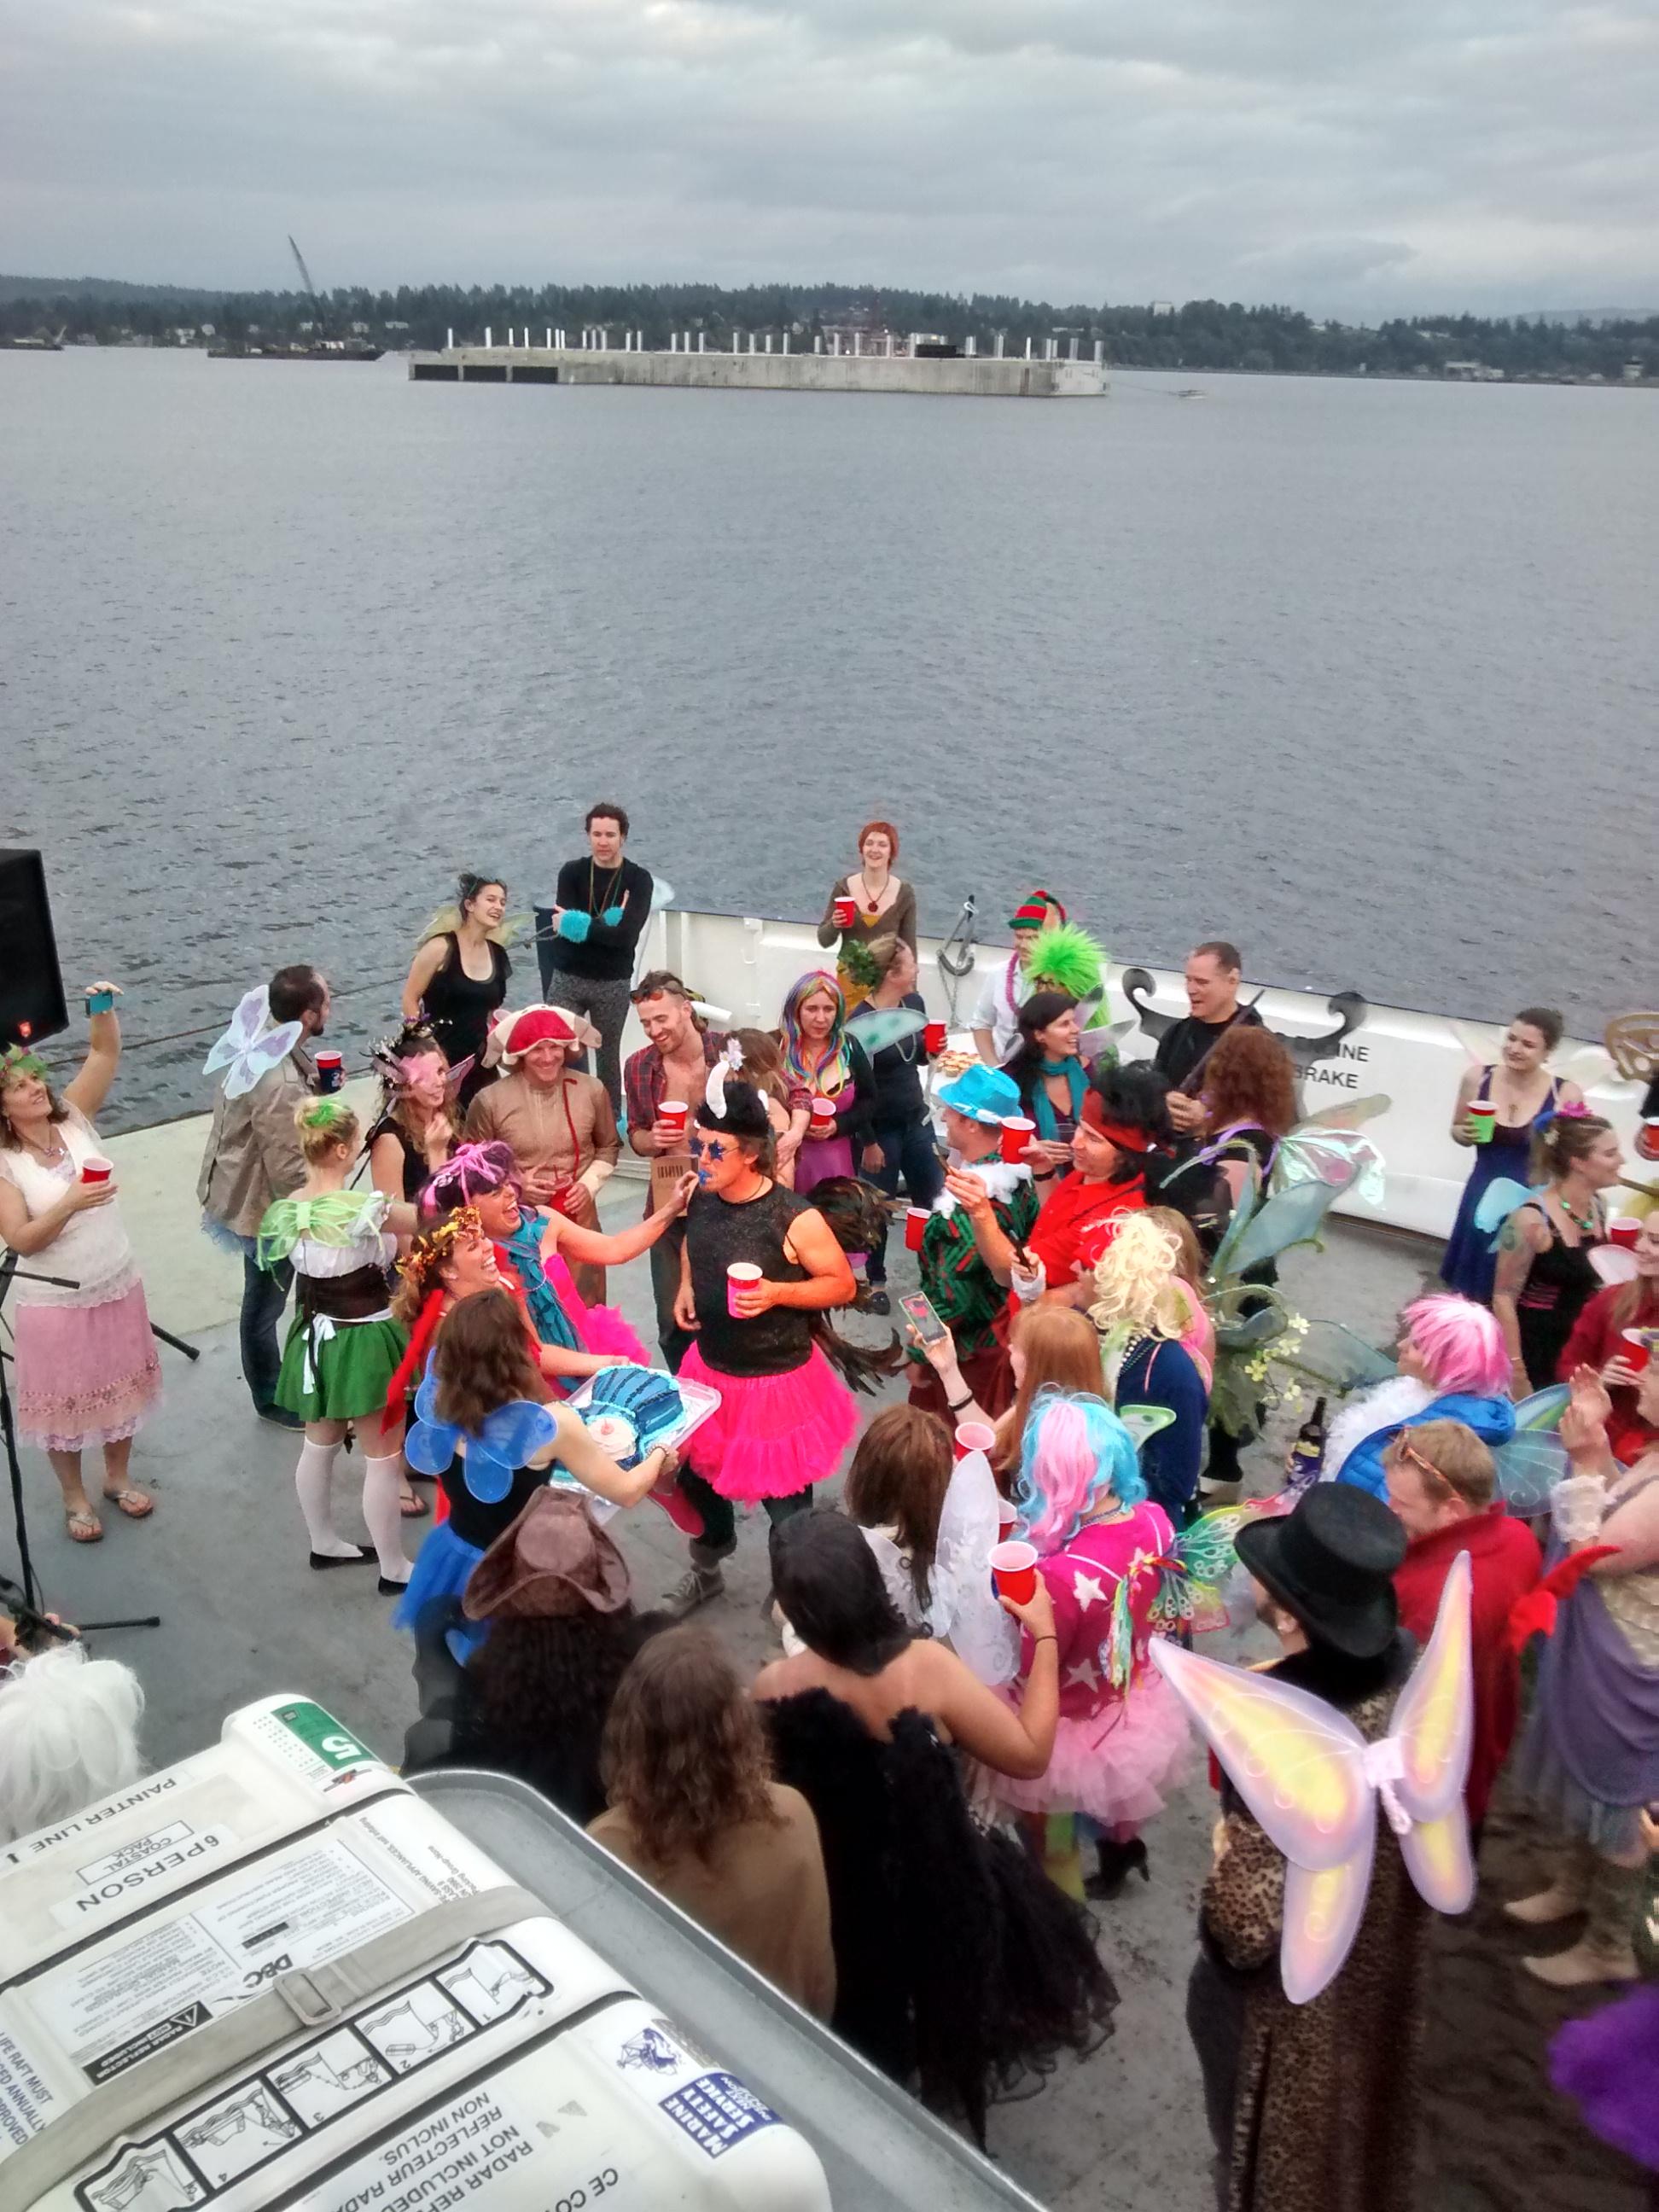 Beach Wedding 10 Guests